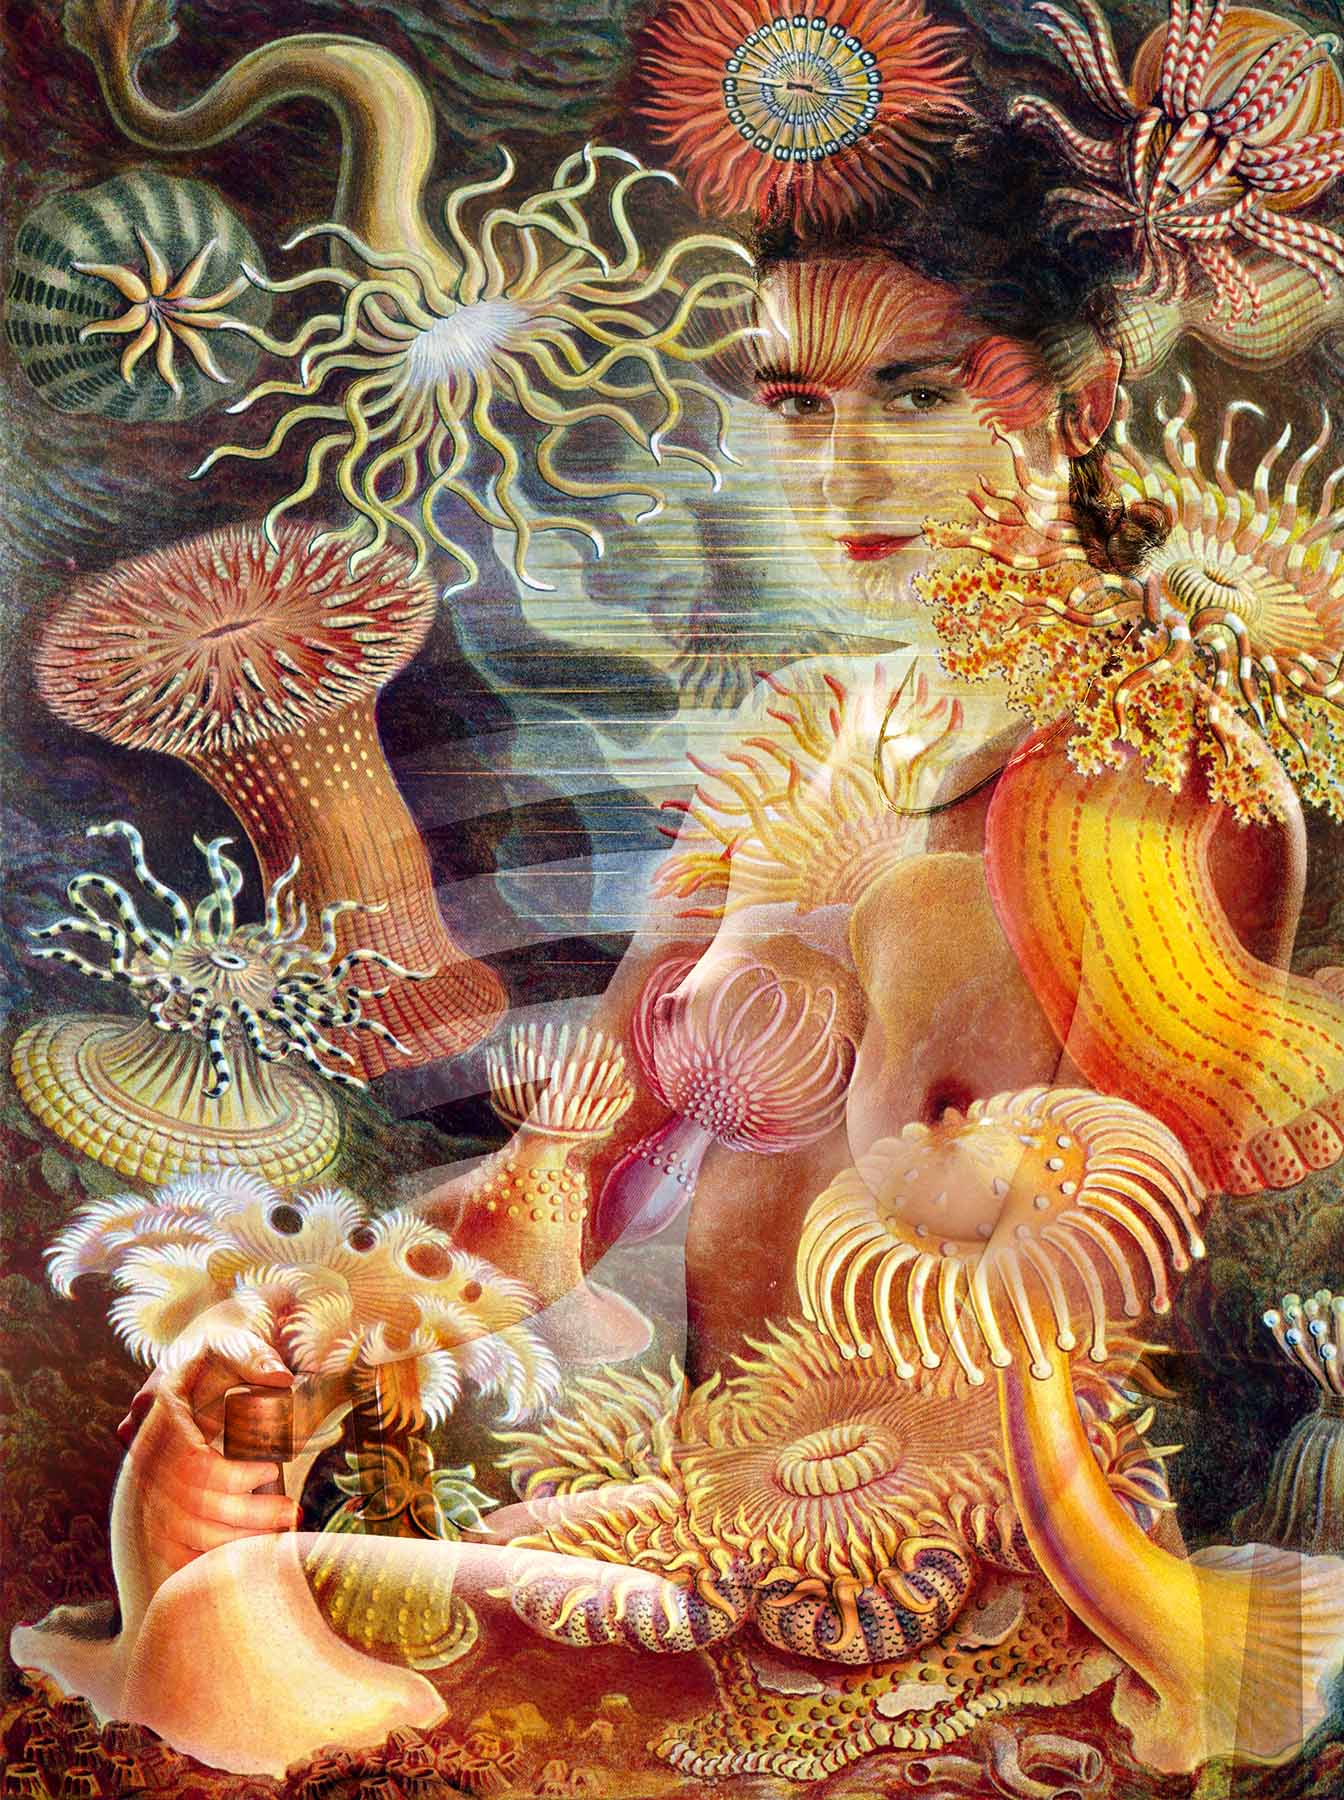 "Photoand collage by Matt Clysdale.Sea anemone illustrationfrom Ernst Haeckel's ""Kunstformen der Natur (Art Forms of Nature) of 1904"